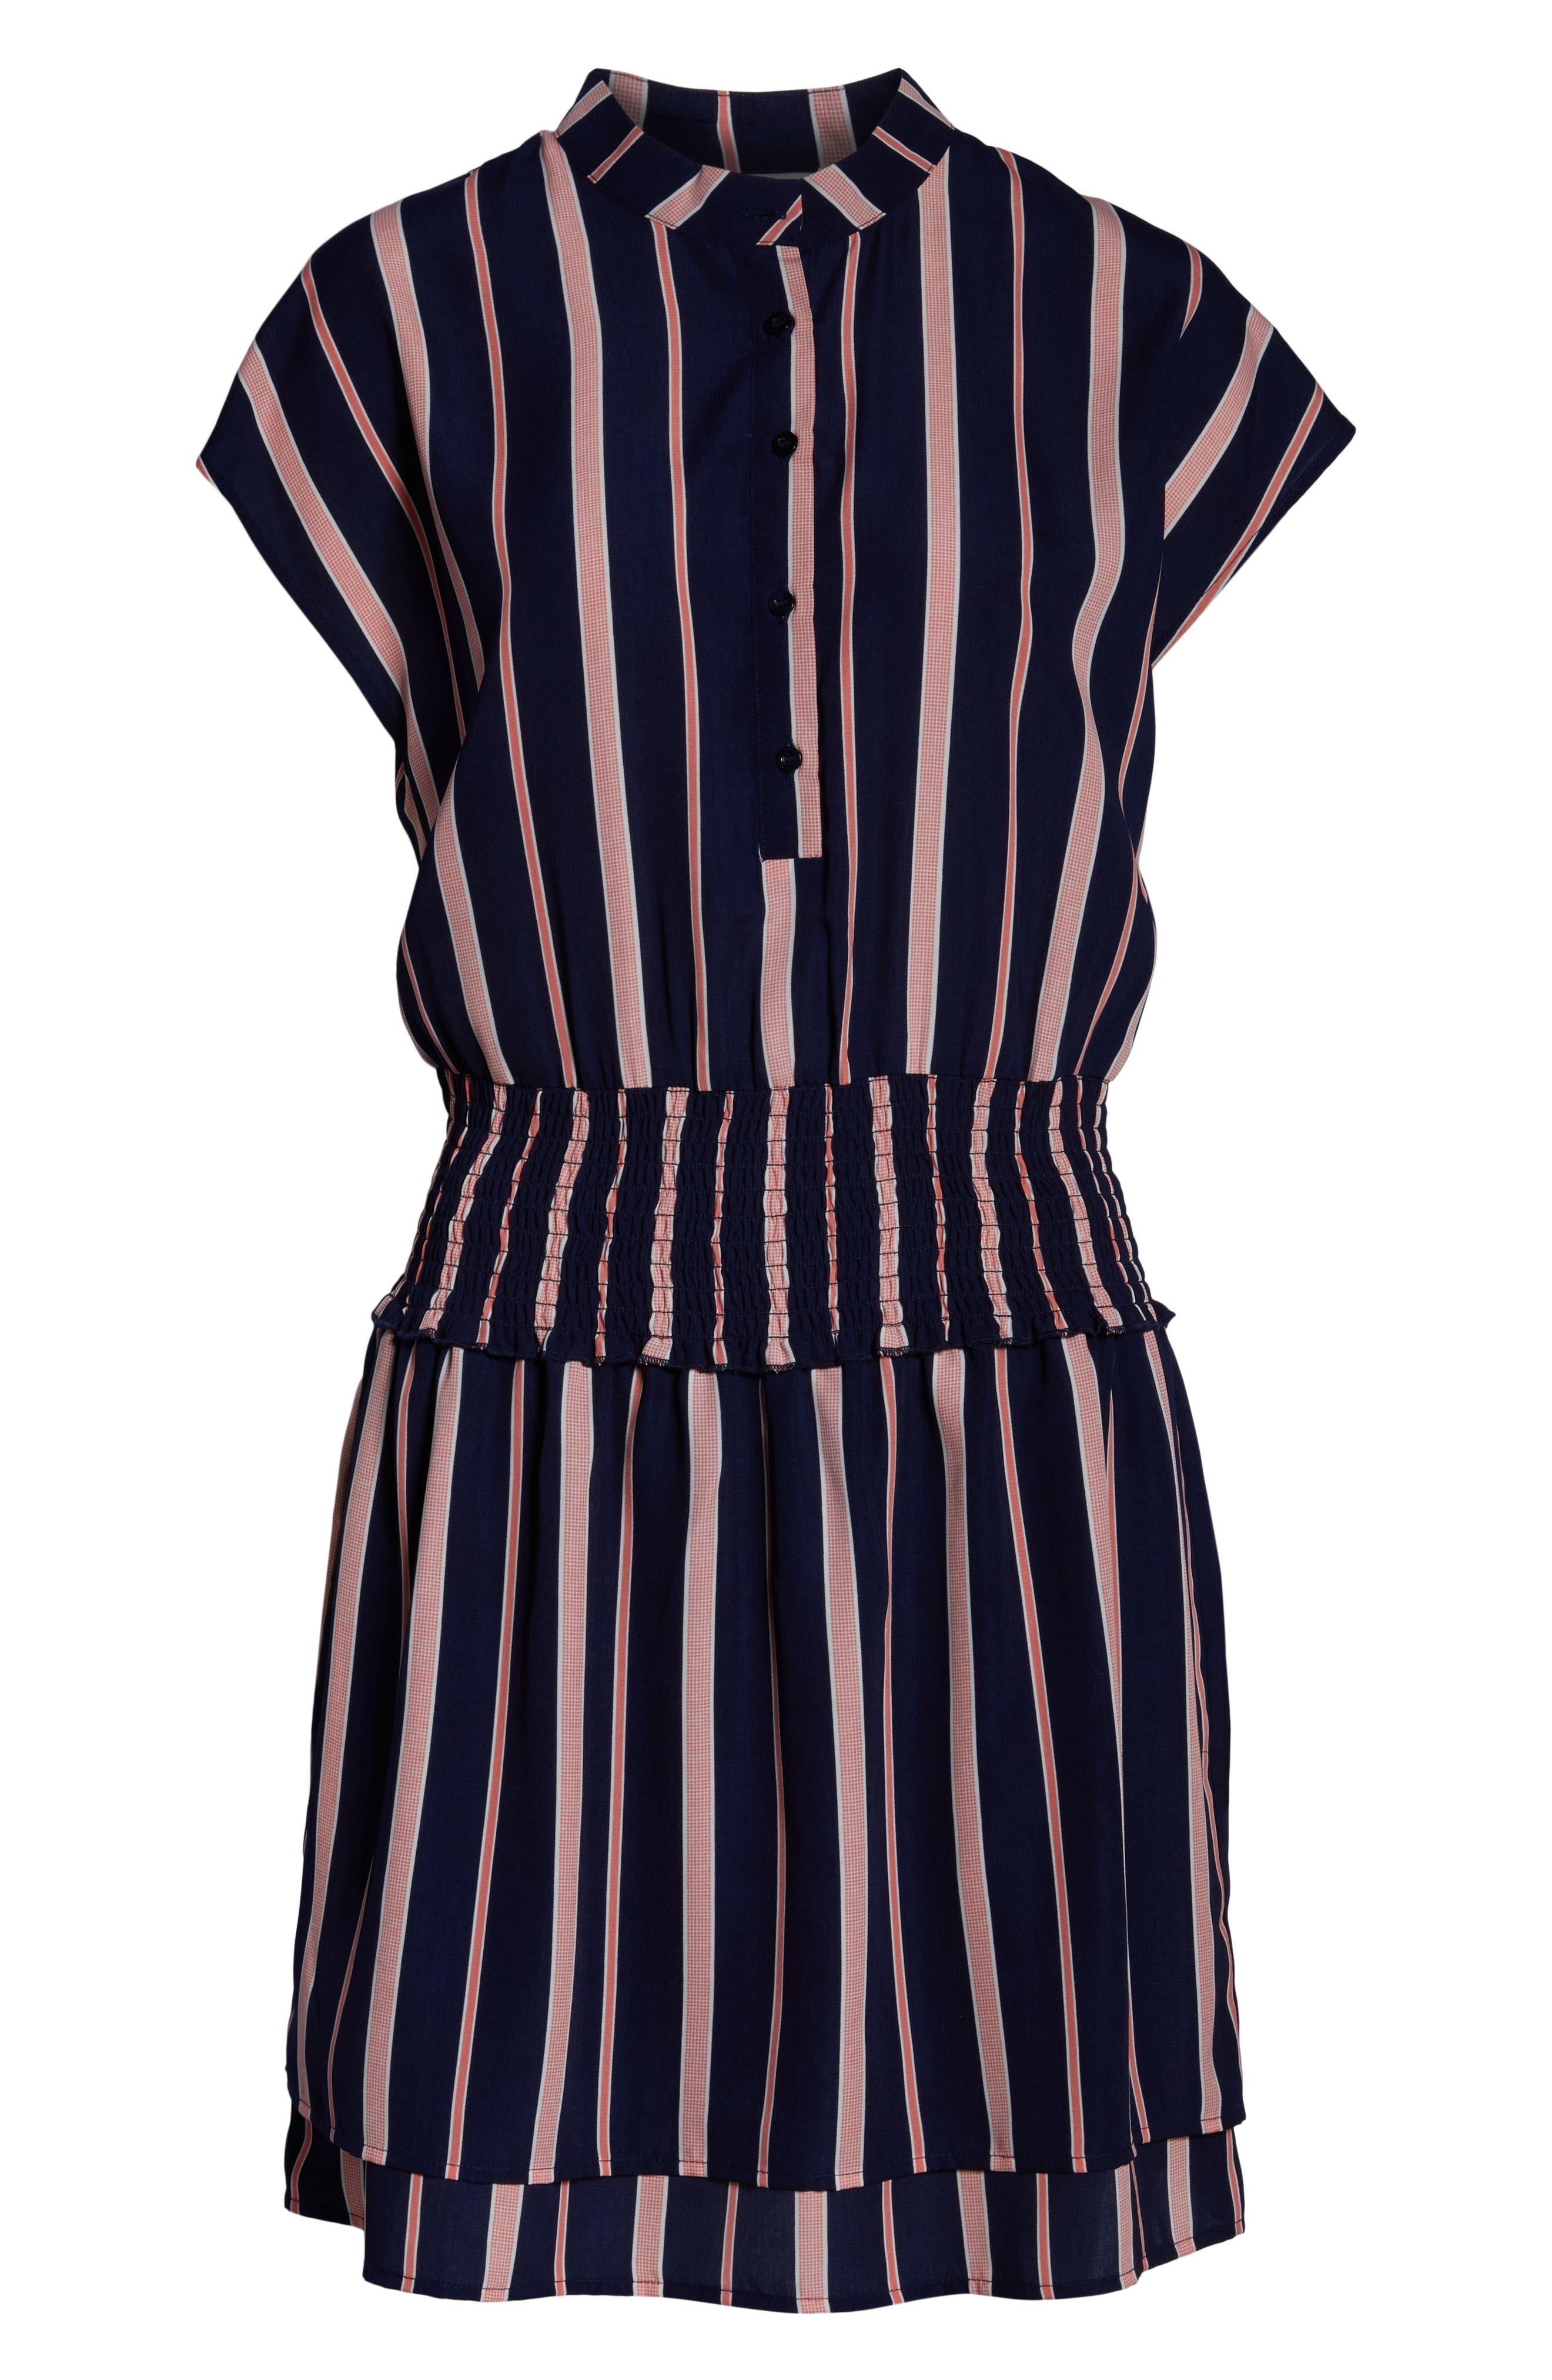 CHARLES HENRY, Smocked Stripe Dress, Alternate thumbnail 7, color, NAVY/ PINK STRIPE